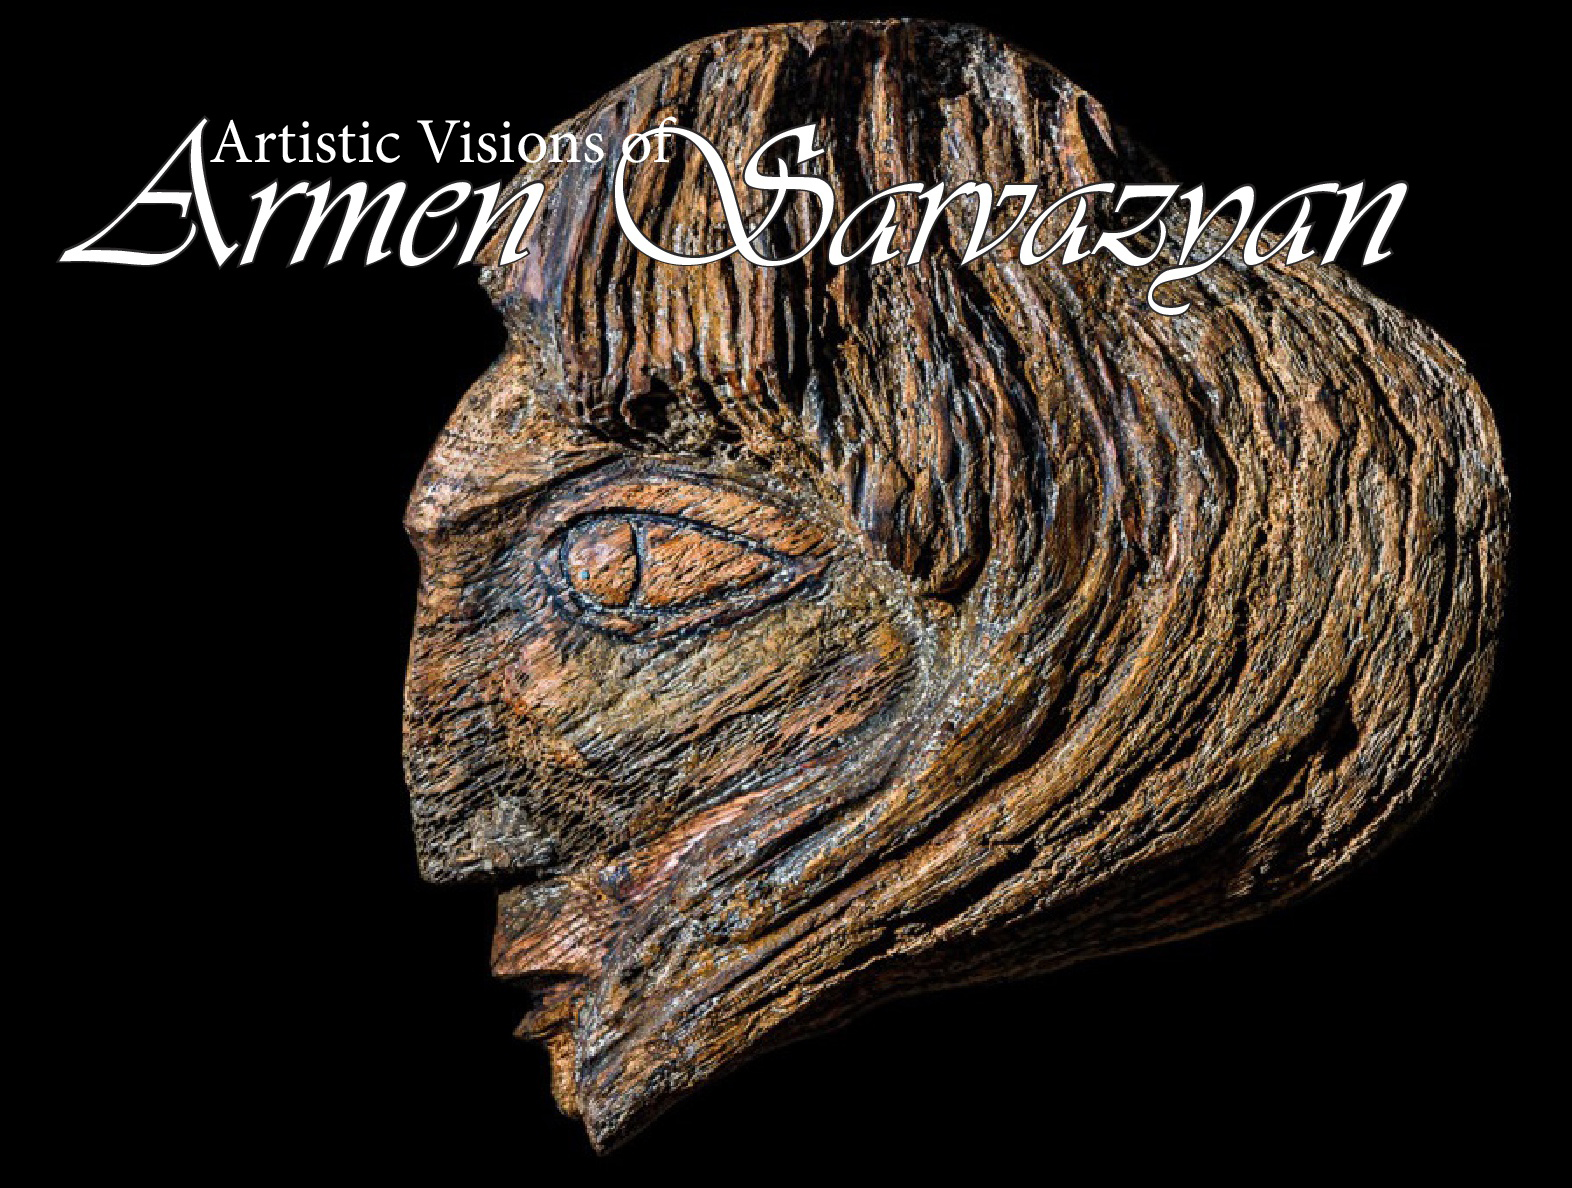 Artistic Visions of Armen Sarvazyan